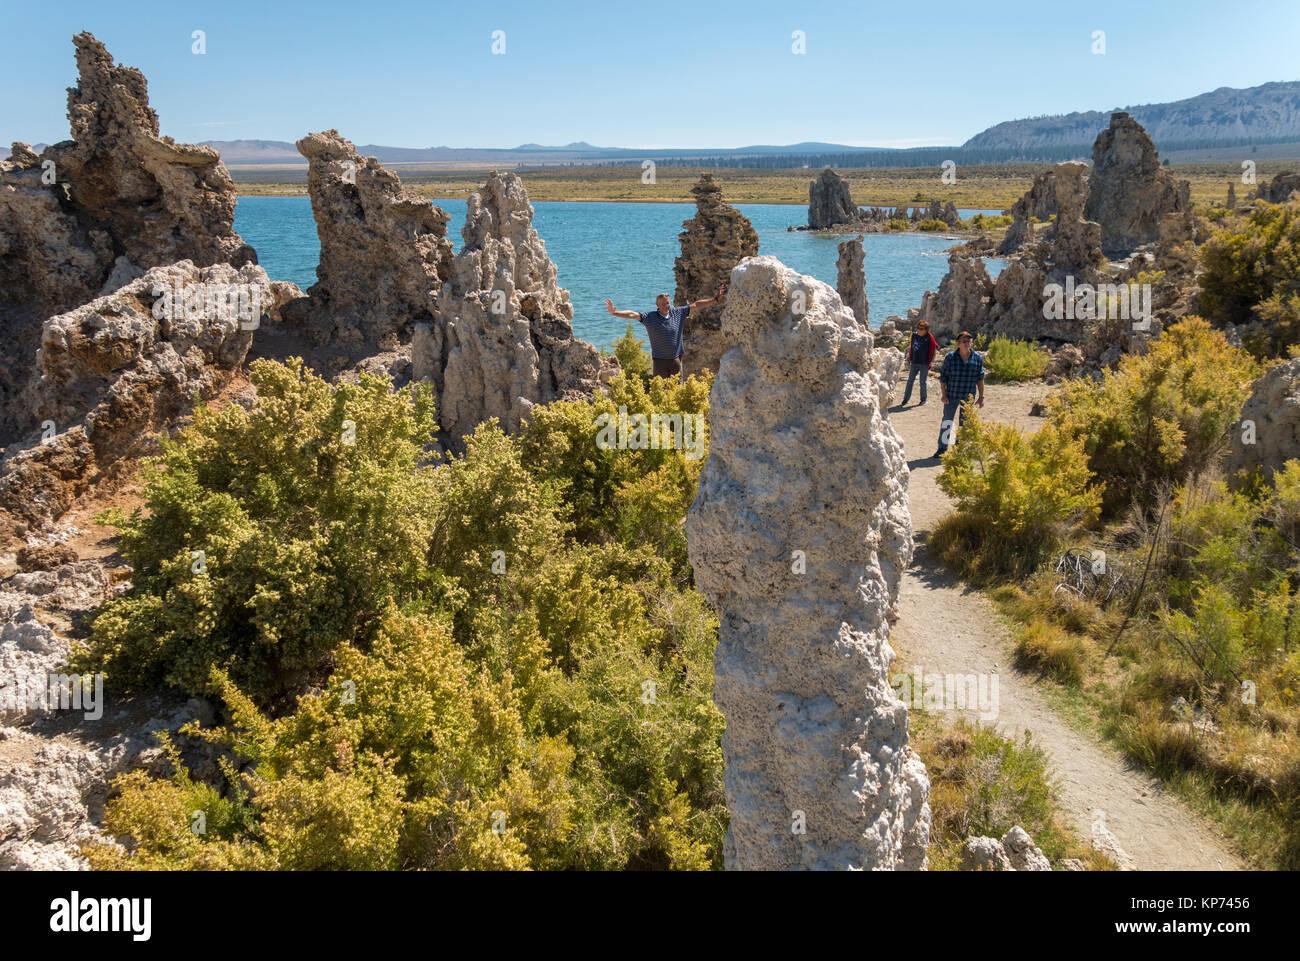 https://c7.alamy.com/comp/KP7456/mono-lake-california-tourists-walking-among-the-tufa-rock-formations-KP7456.jpg